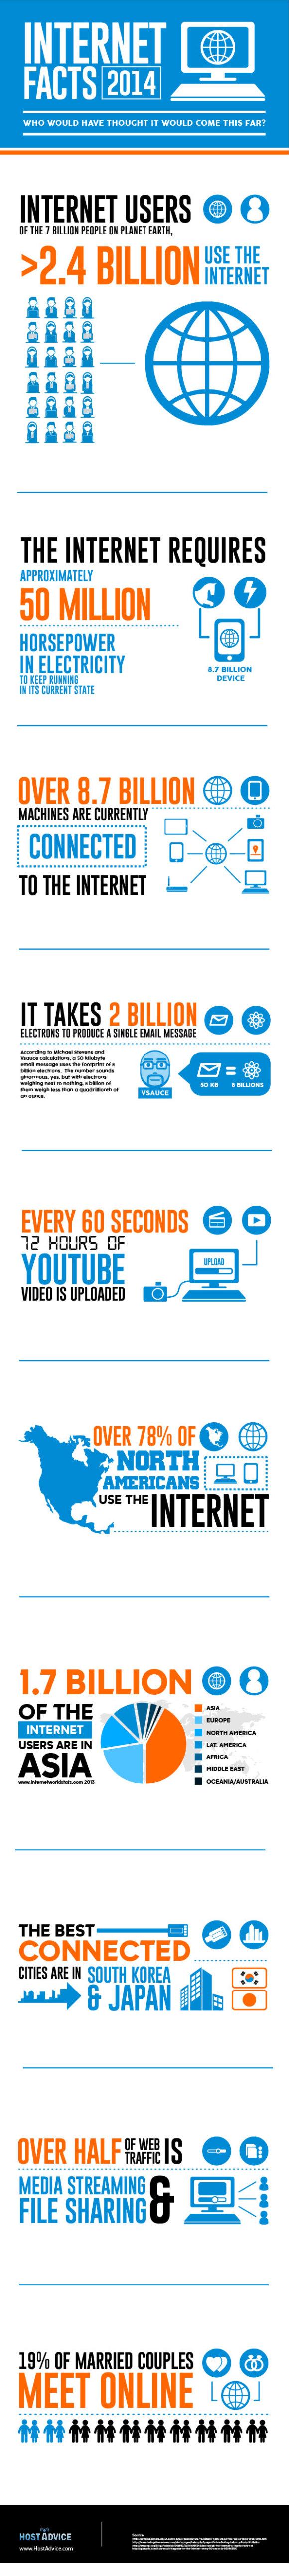 INFOG - Insane-Internet-Facts-2014-580x5174